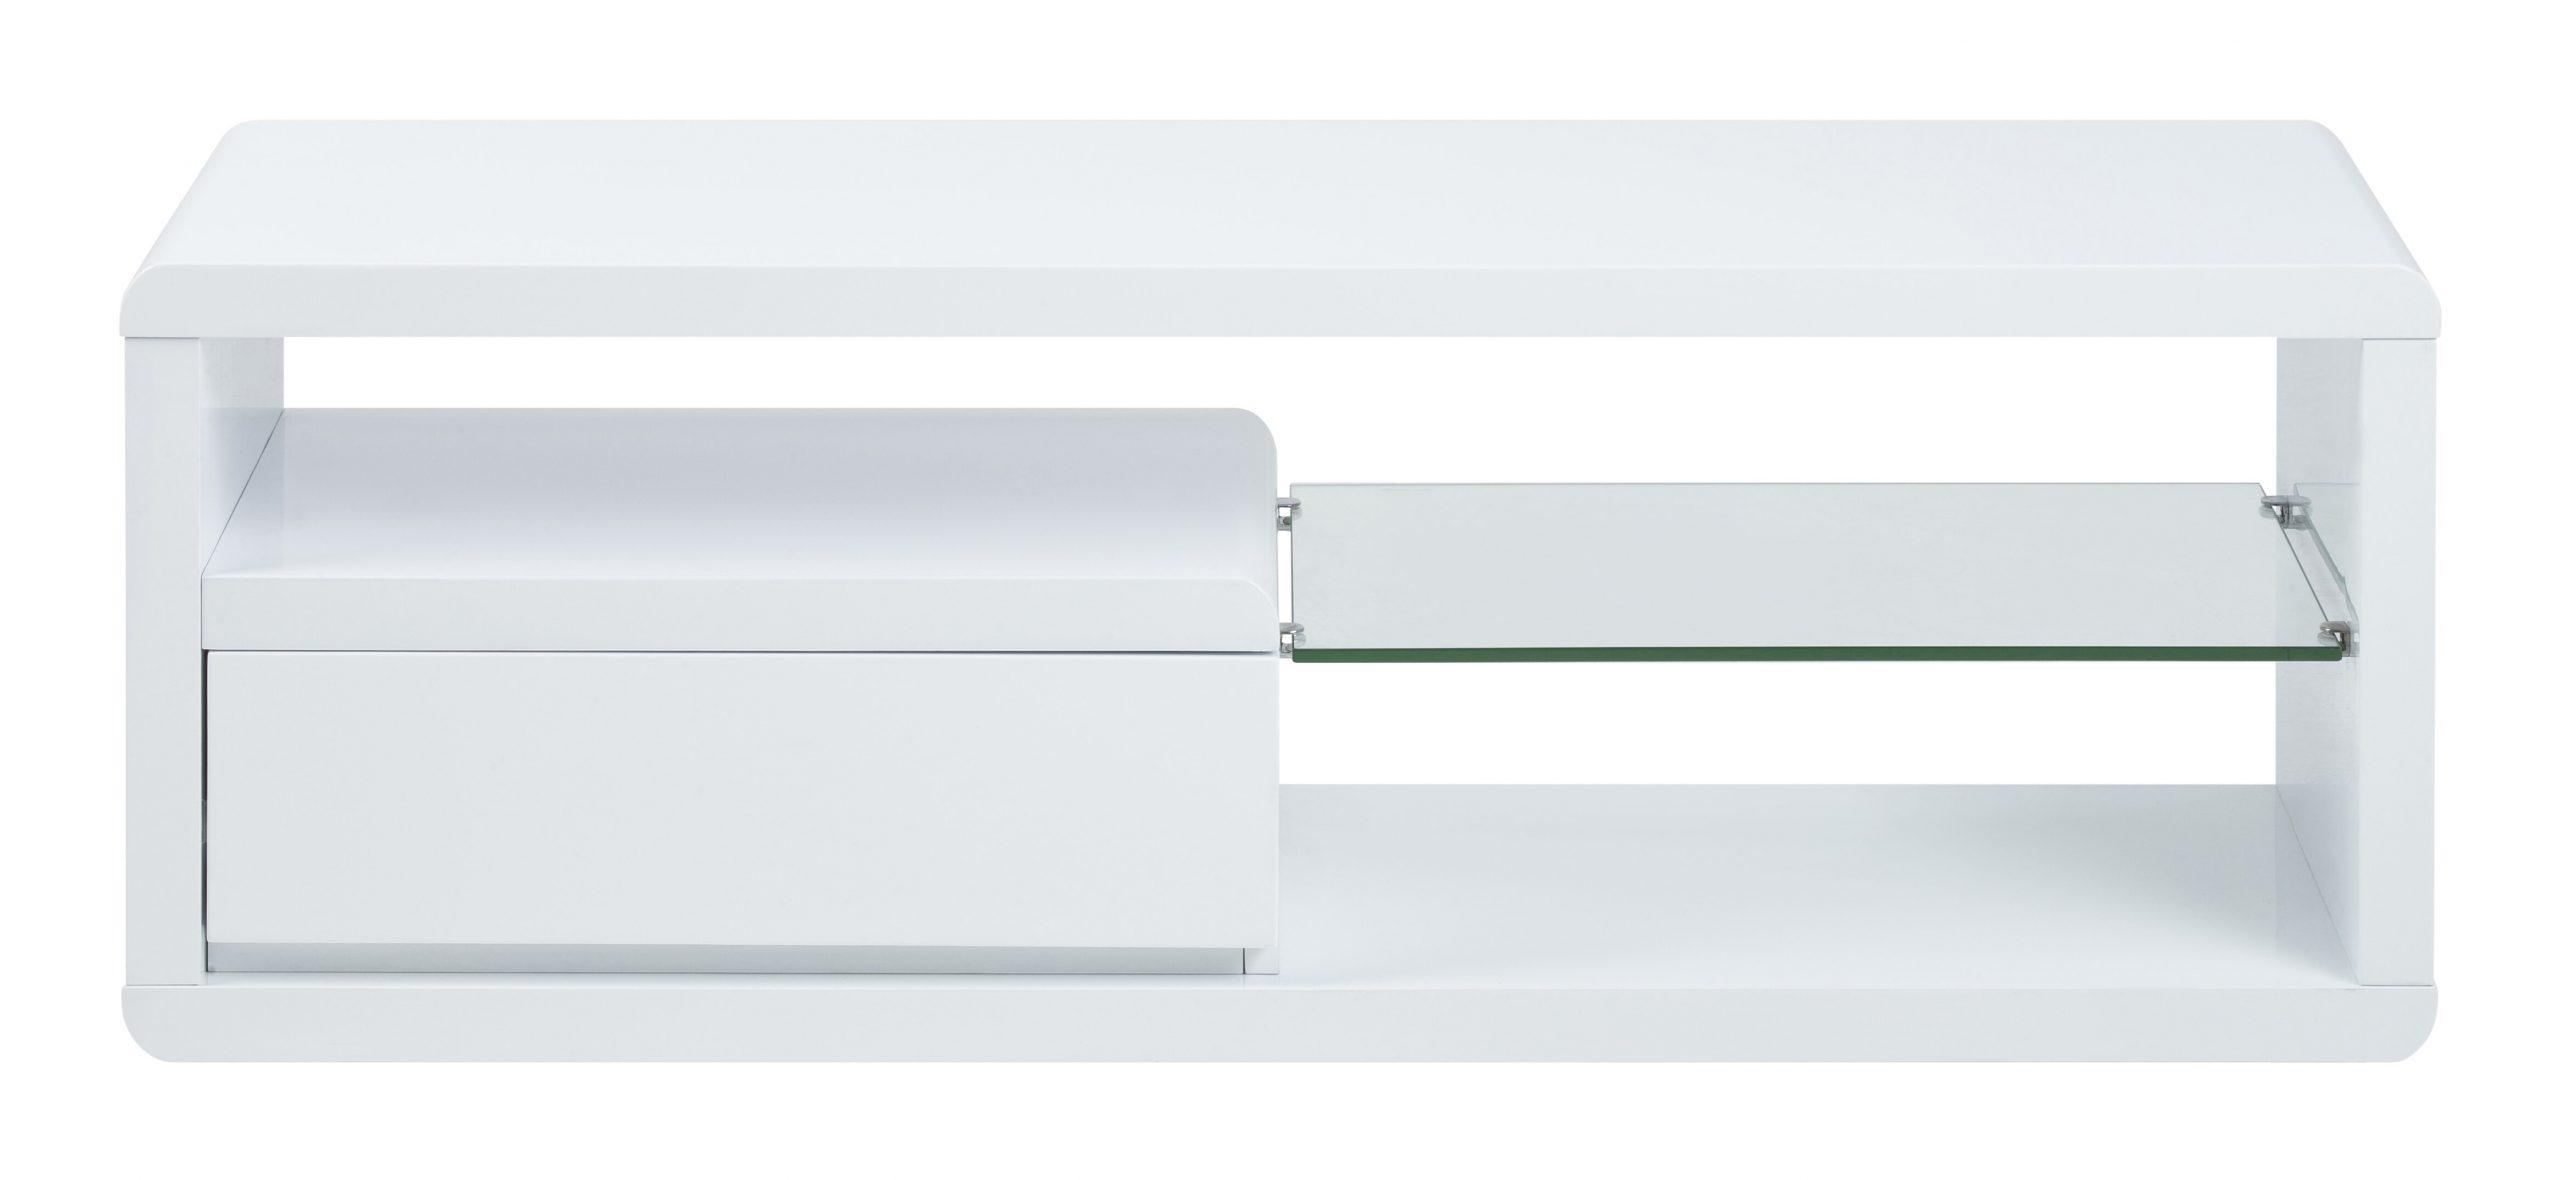 Bendt Tv-meubel 'Carsten' 120cm, kleur wit   Bendt